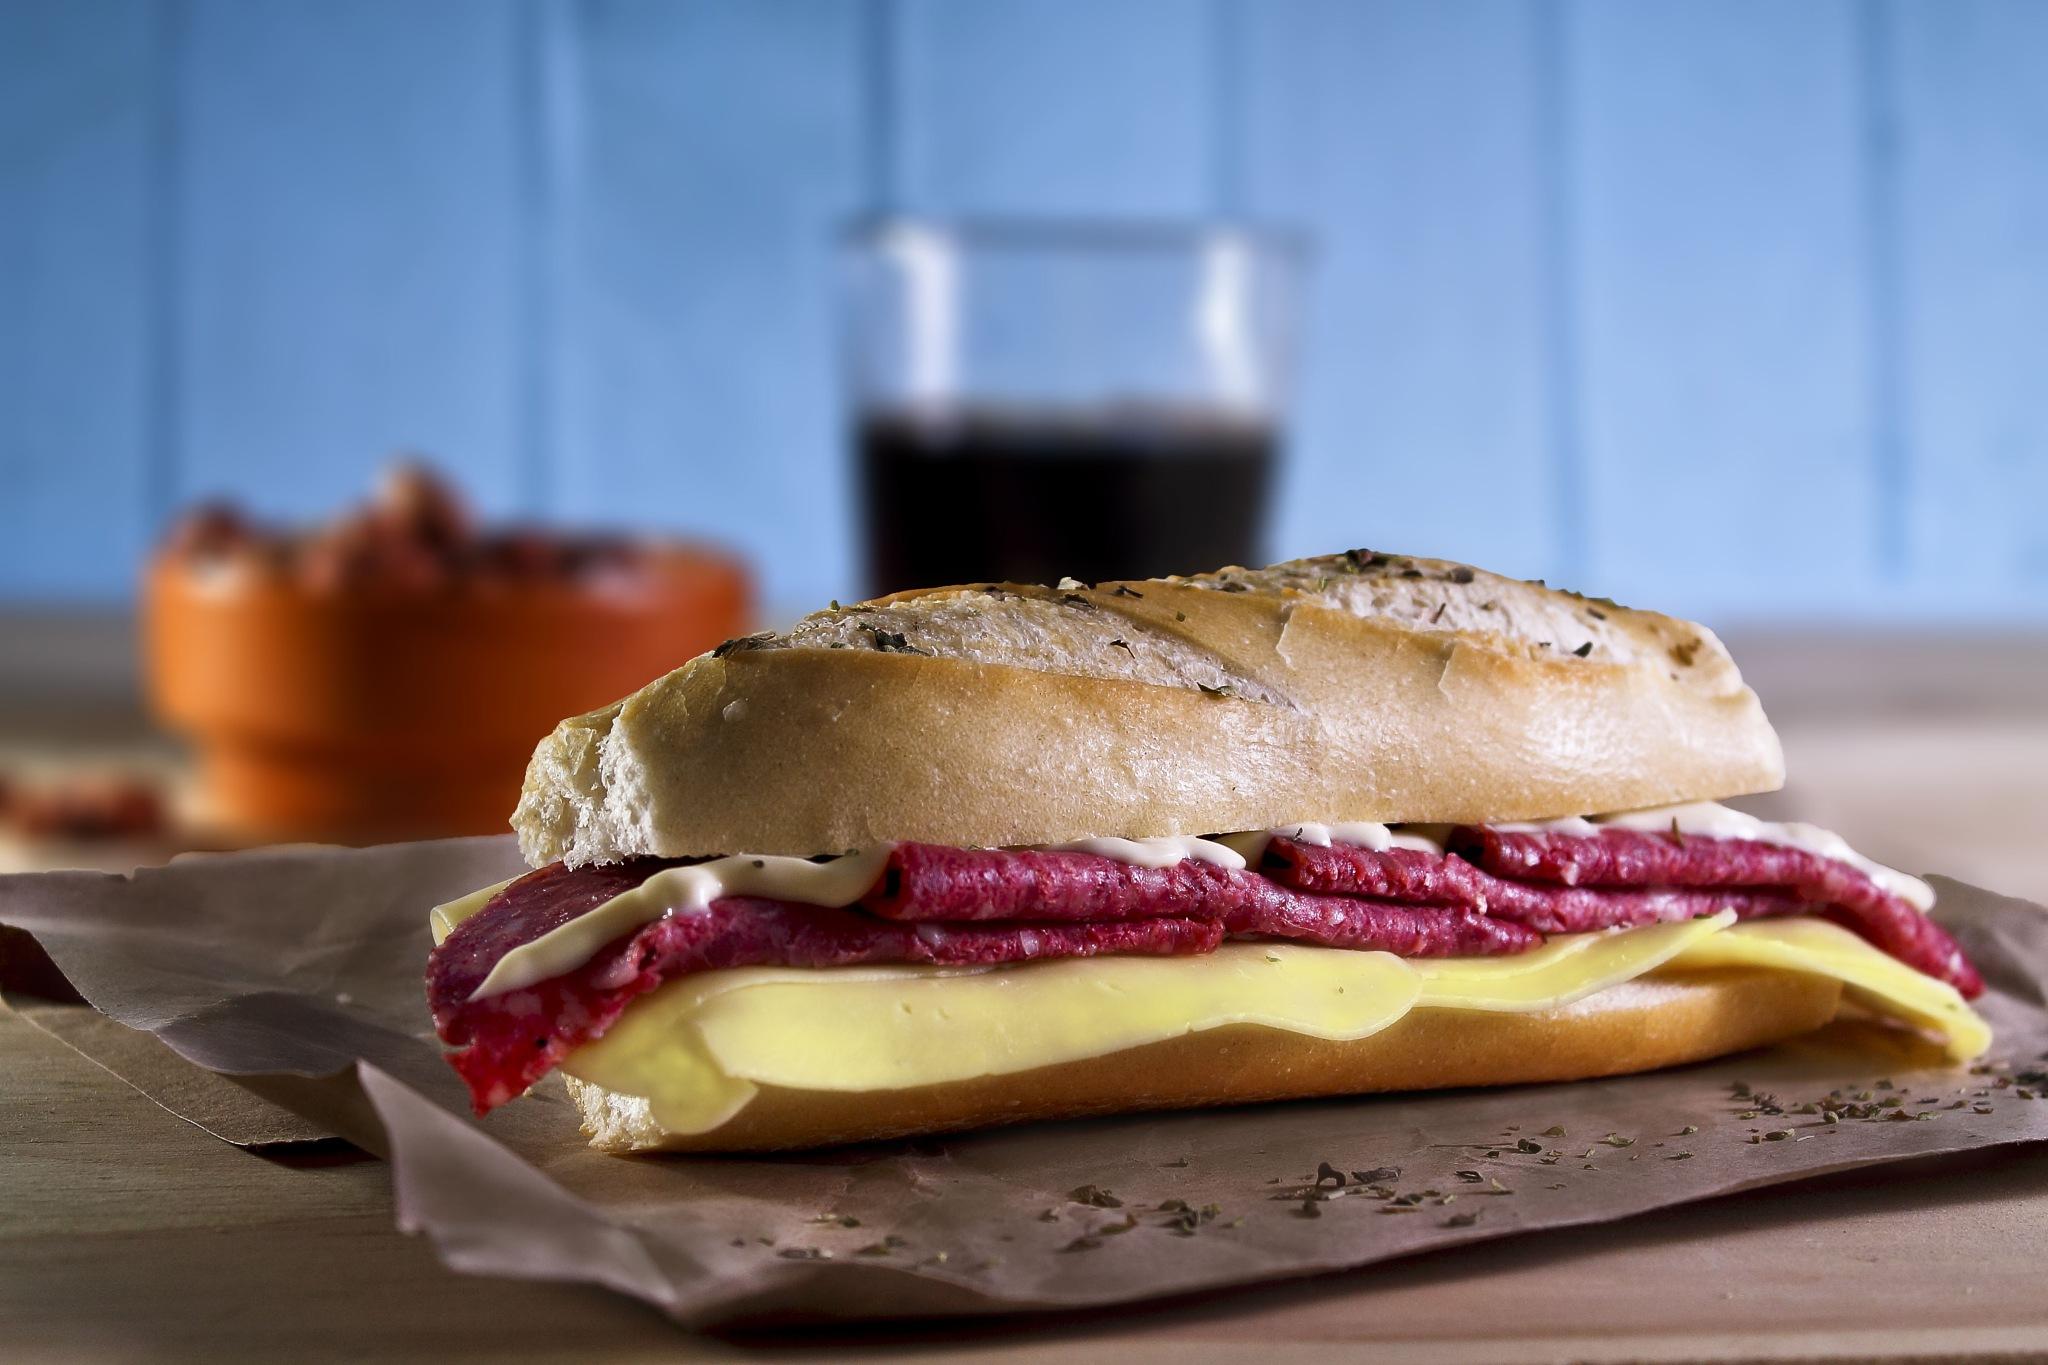 """Sandwich"" by ulis rinat fotografia"